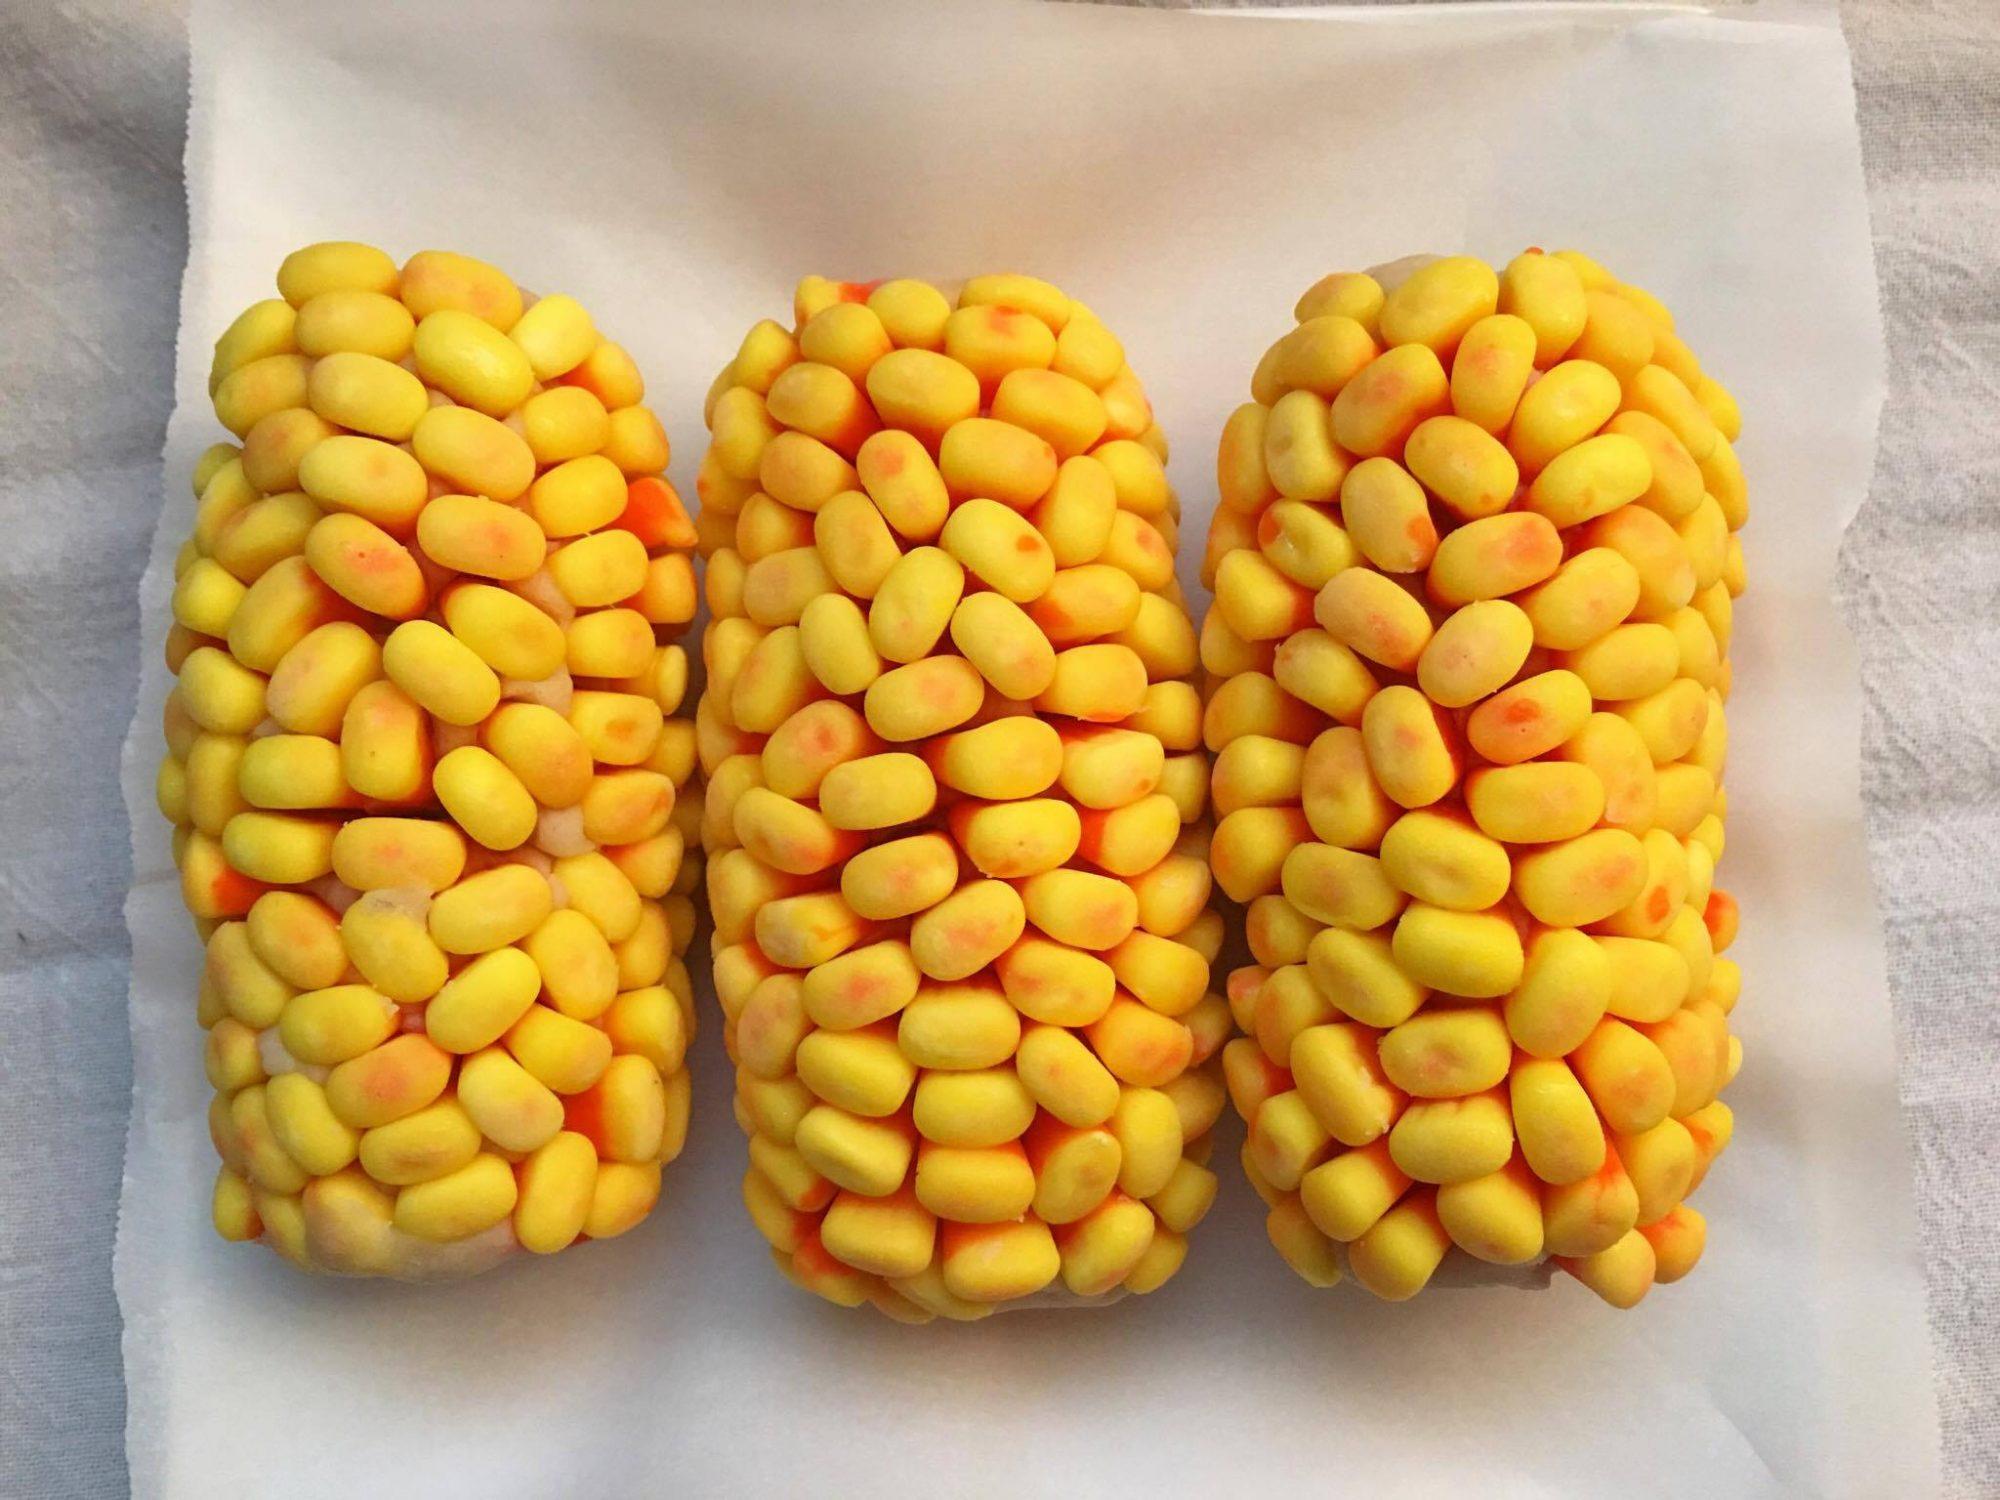 Candy Corn Cob image